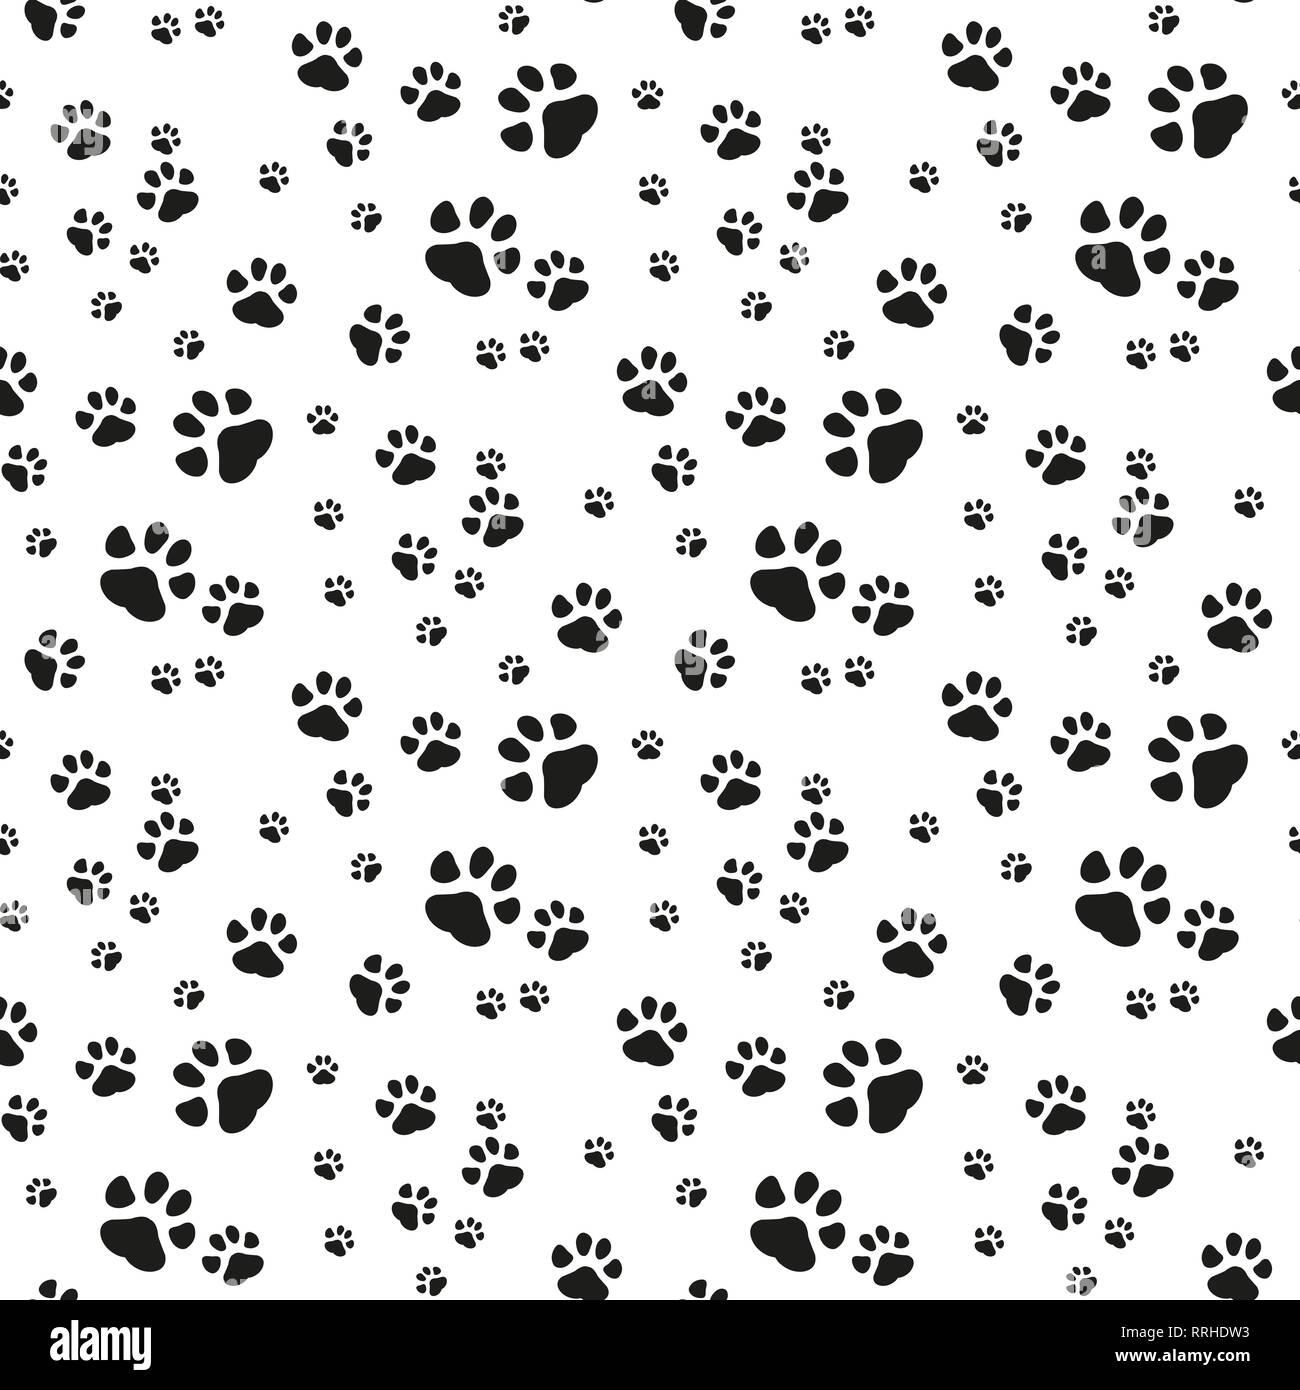 Dog Paw Seamless Pattern Vector Footprint Kitten Puppy Tile Background Repeat Wallpaper Cartoon Isolated Illustration White Vector Illustration Eps Stock Vector Image Art Alamy